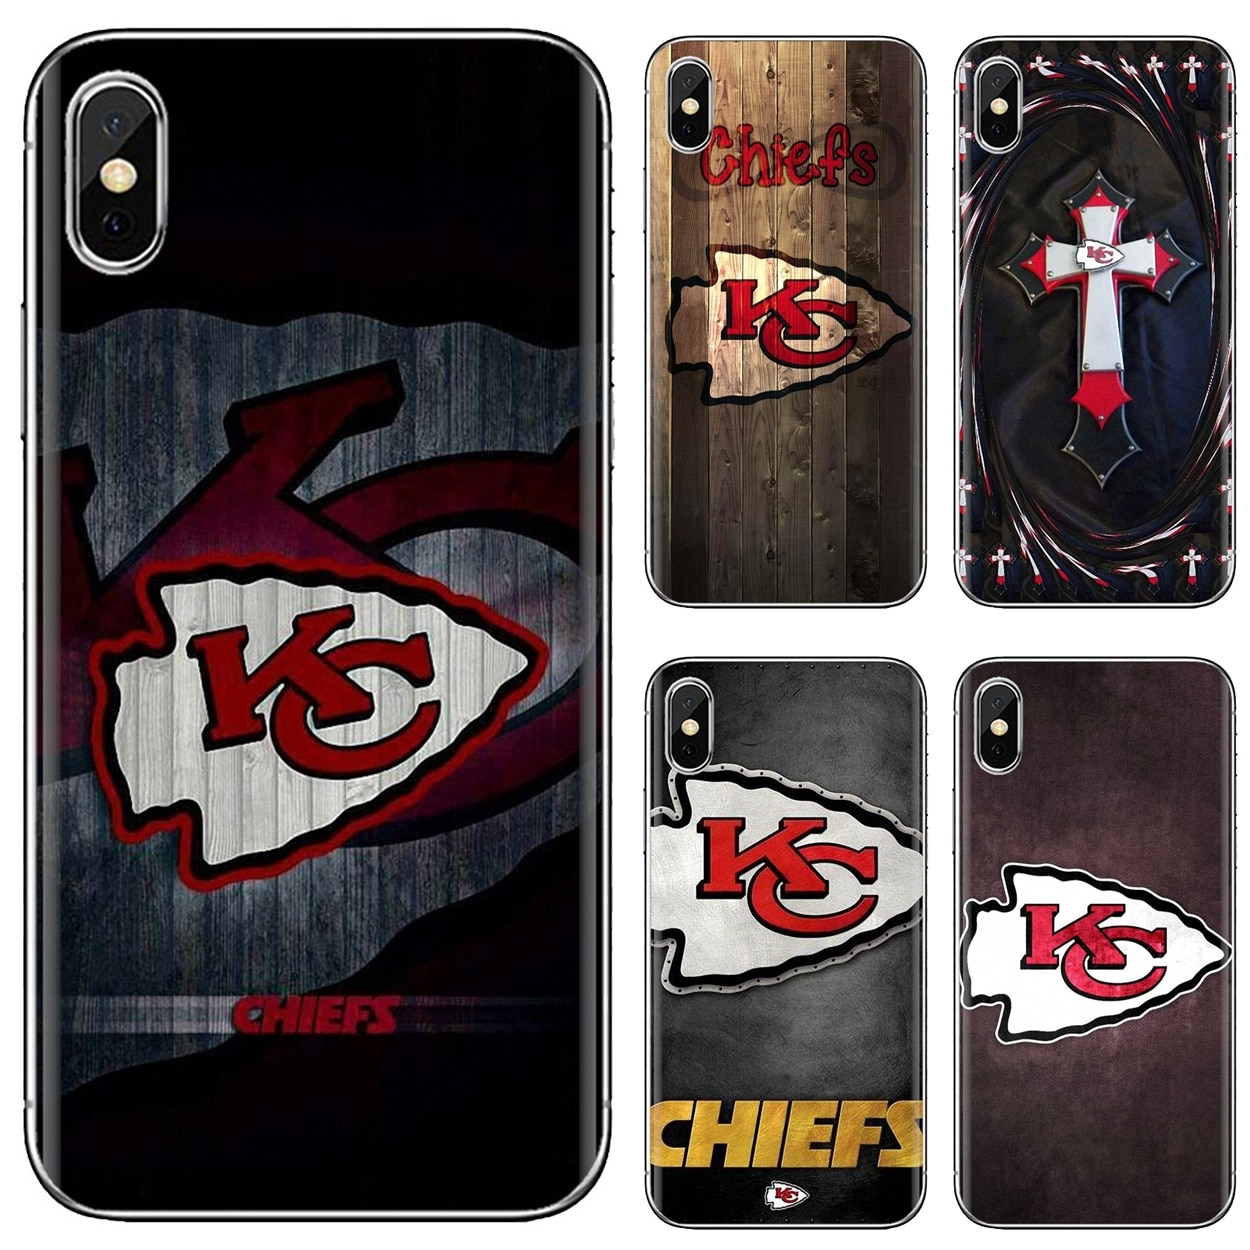 Para iphone 11 pro 4 4S 5 5S se 5c 6 s 7 8x10 xr xs plus max para ipod touch capa macia kansas city chiefs eua logotipo da equipe cartaz